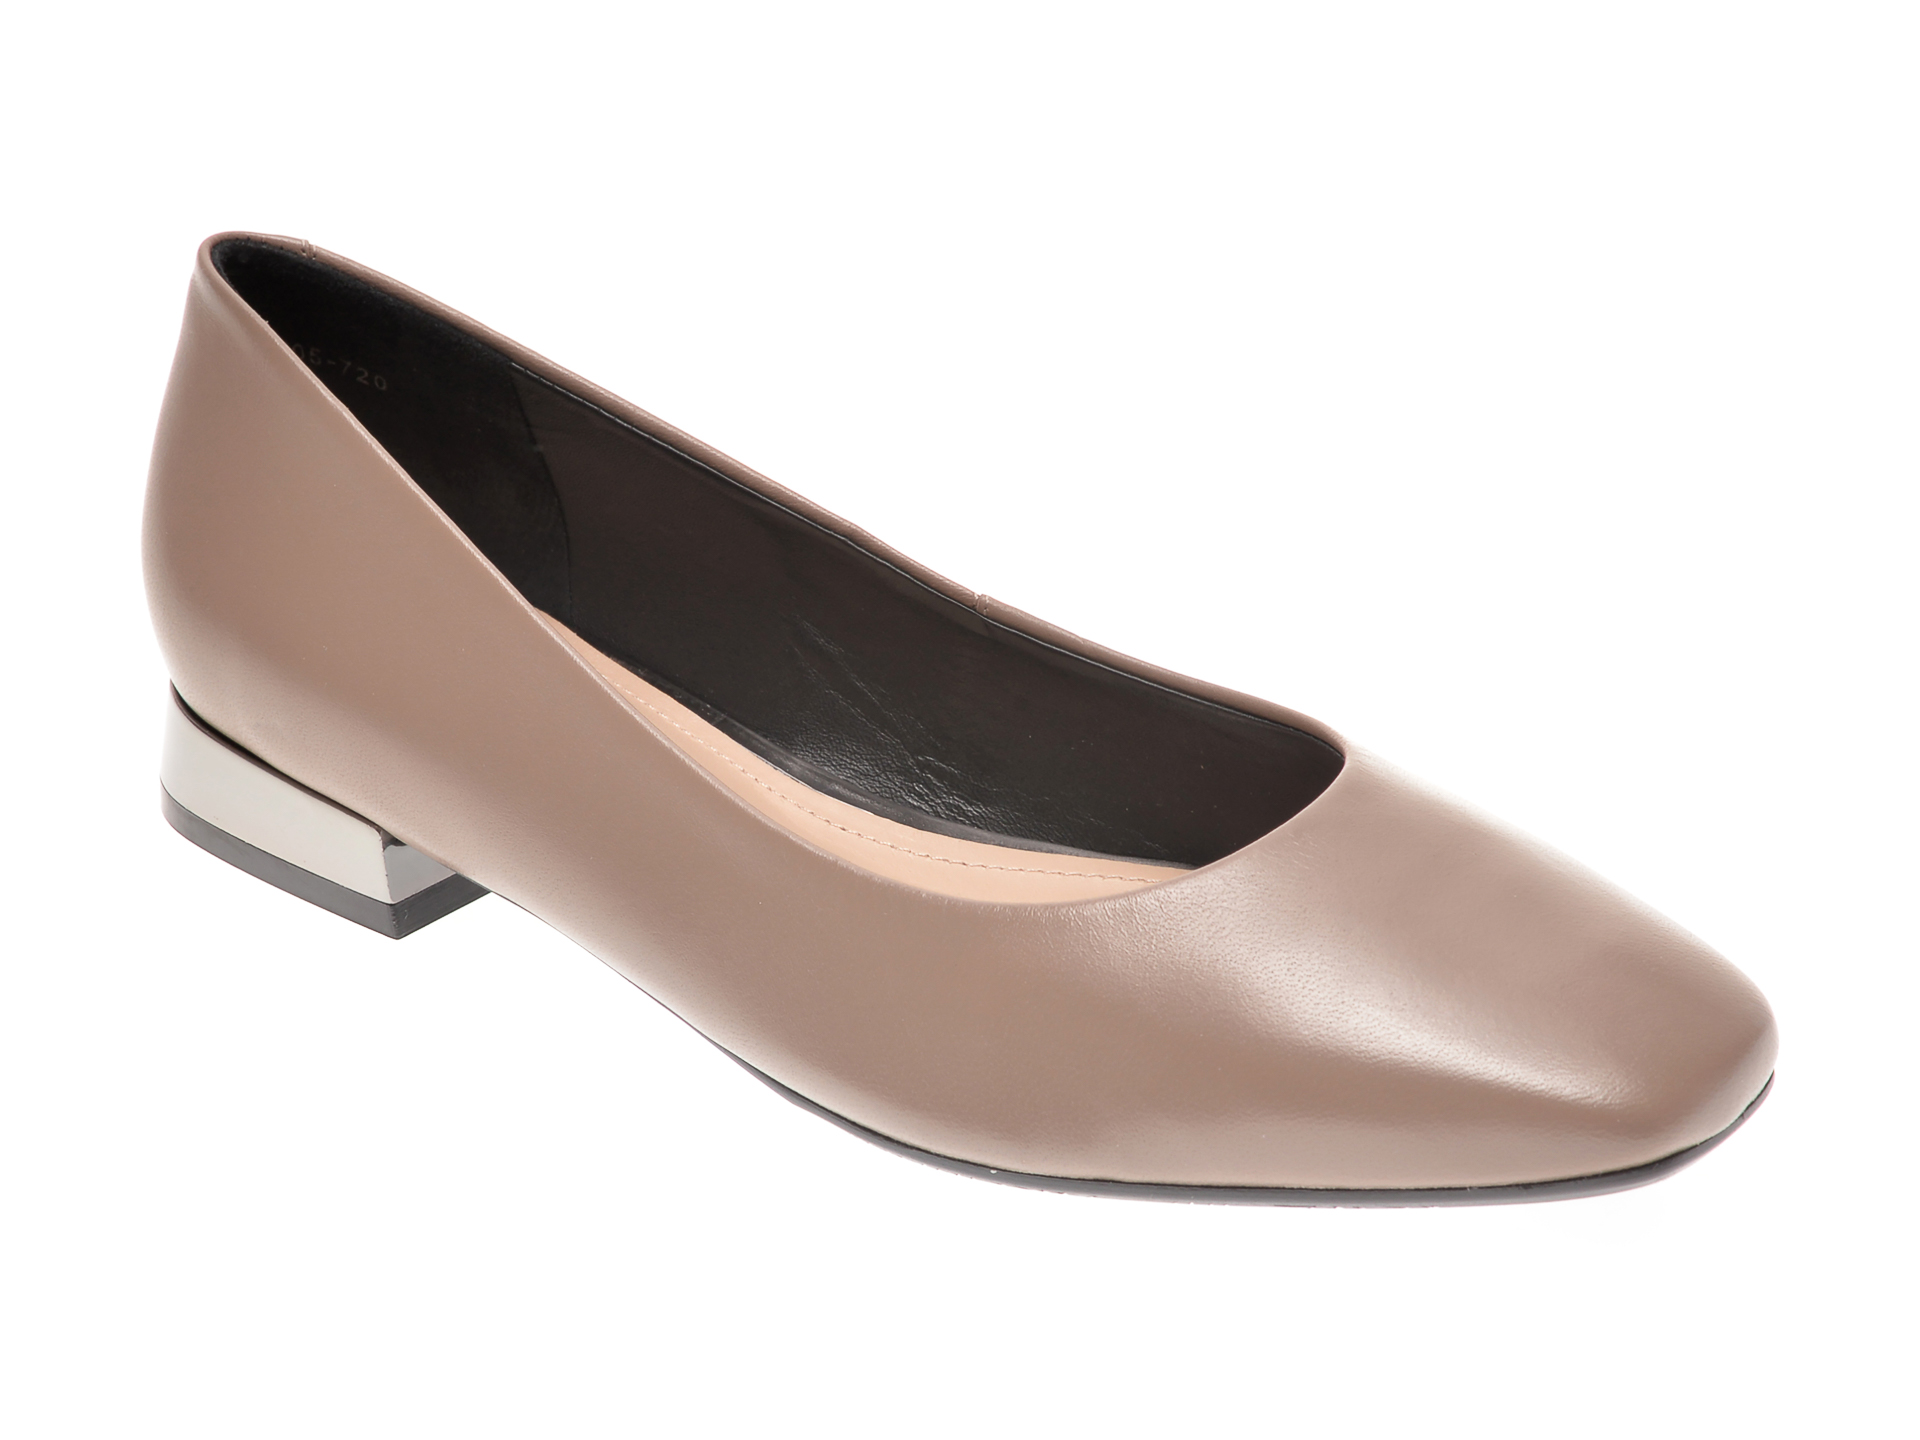 Pantofi EPICA gri, 2154605, din piele naturala